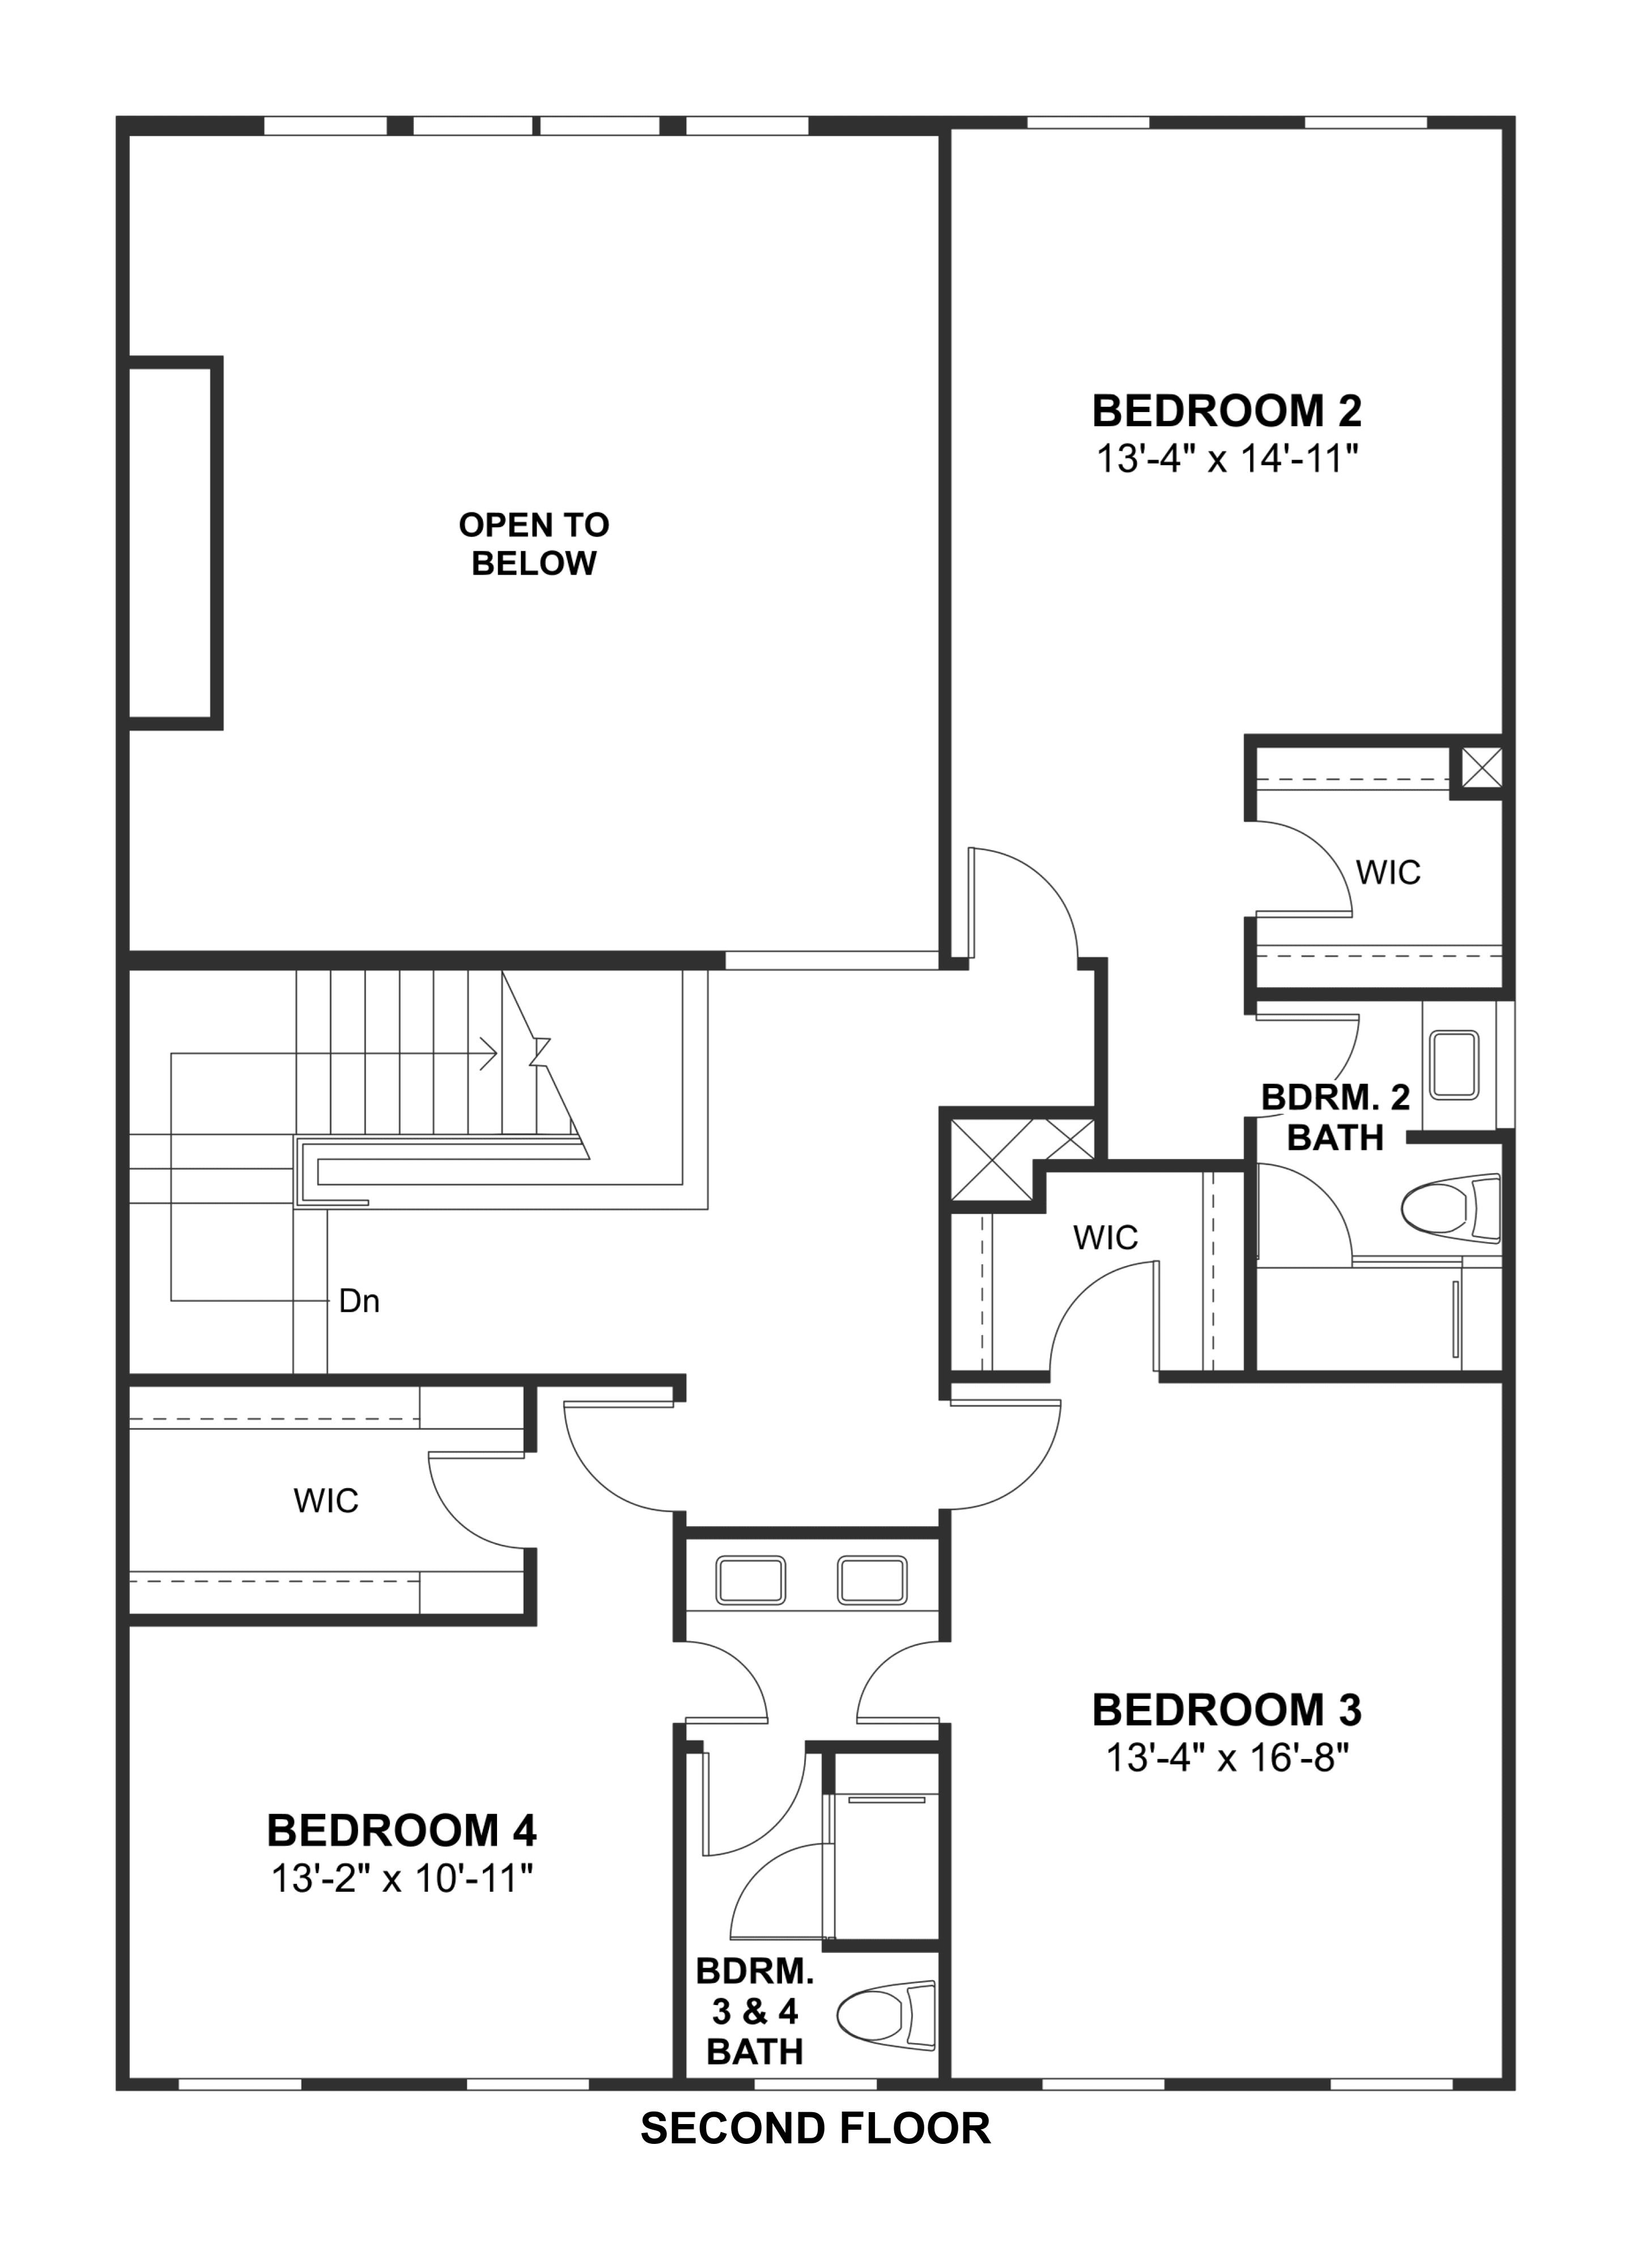 K Hovnanian Homes Floor Plans Images 4moltqacom